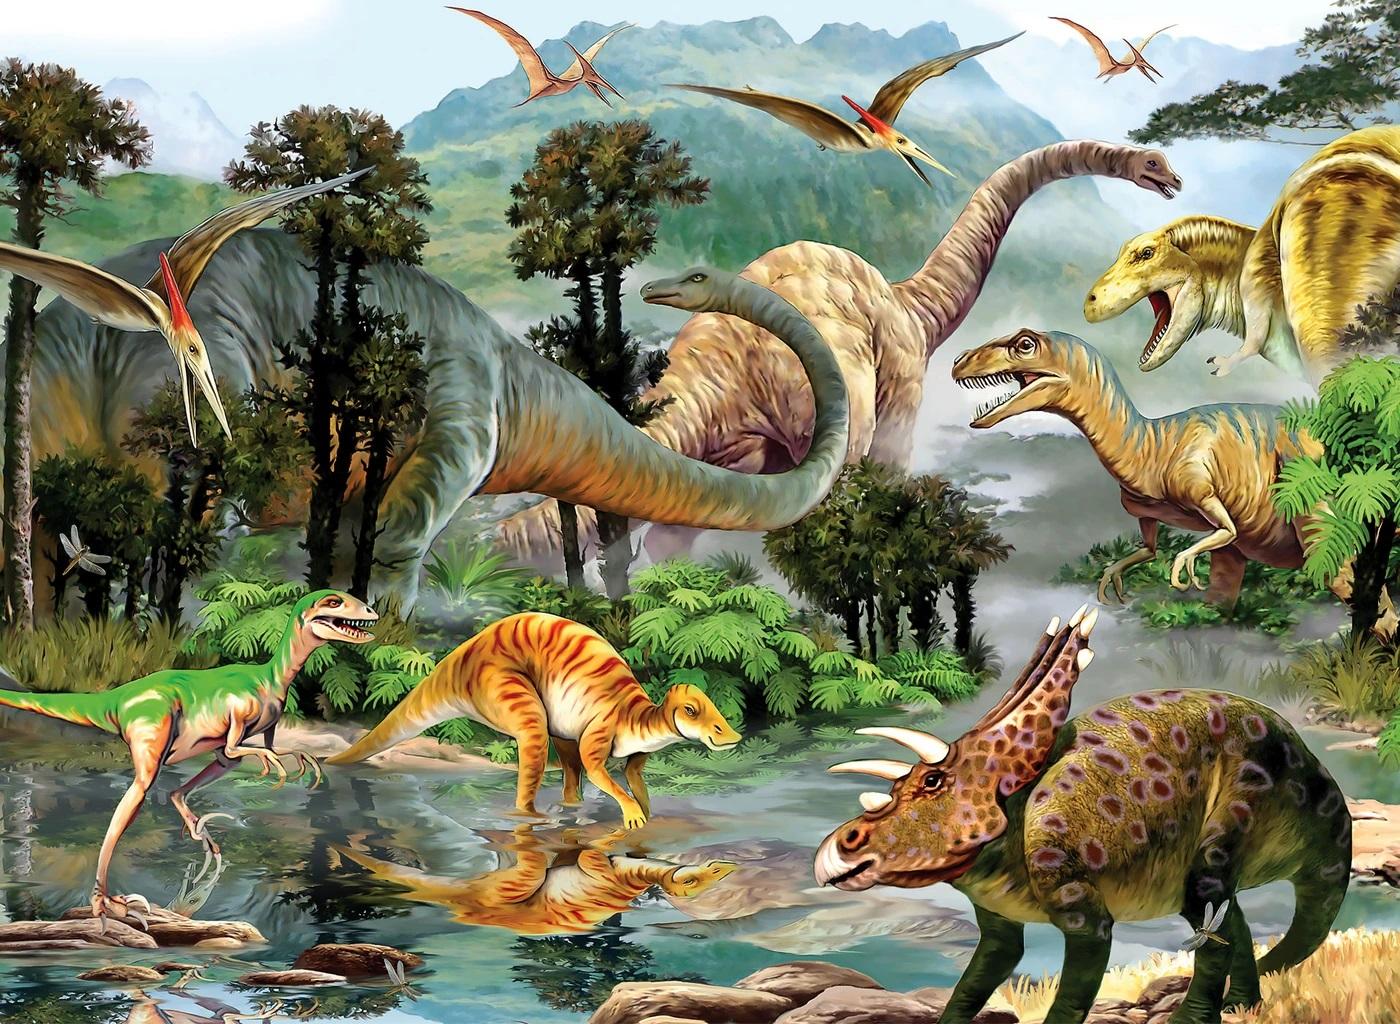 Dino Valley 2 Dinosaurs Jigsaw Puzzle